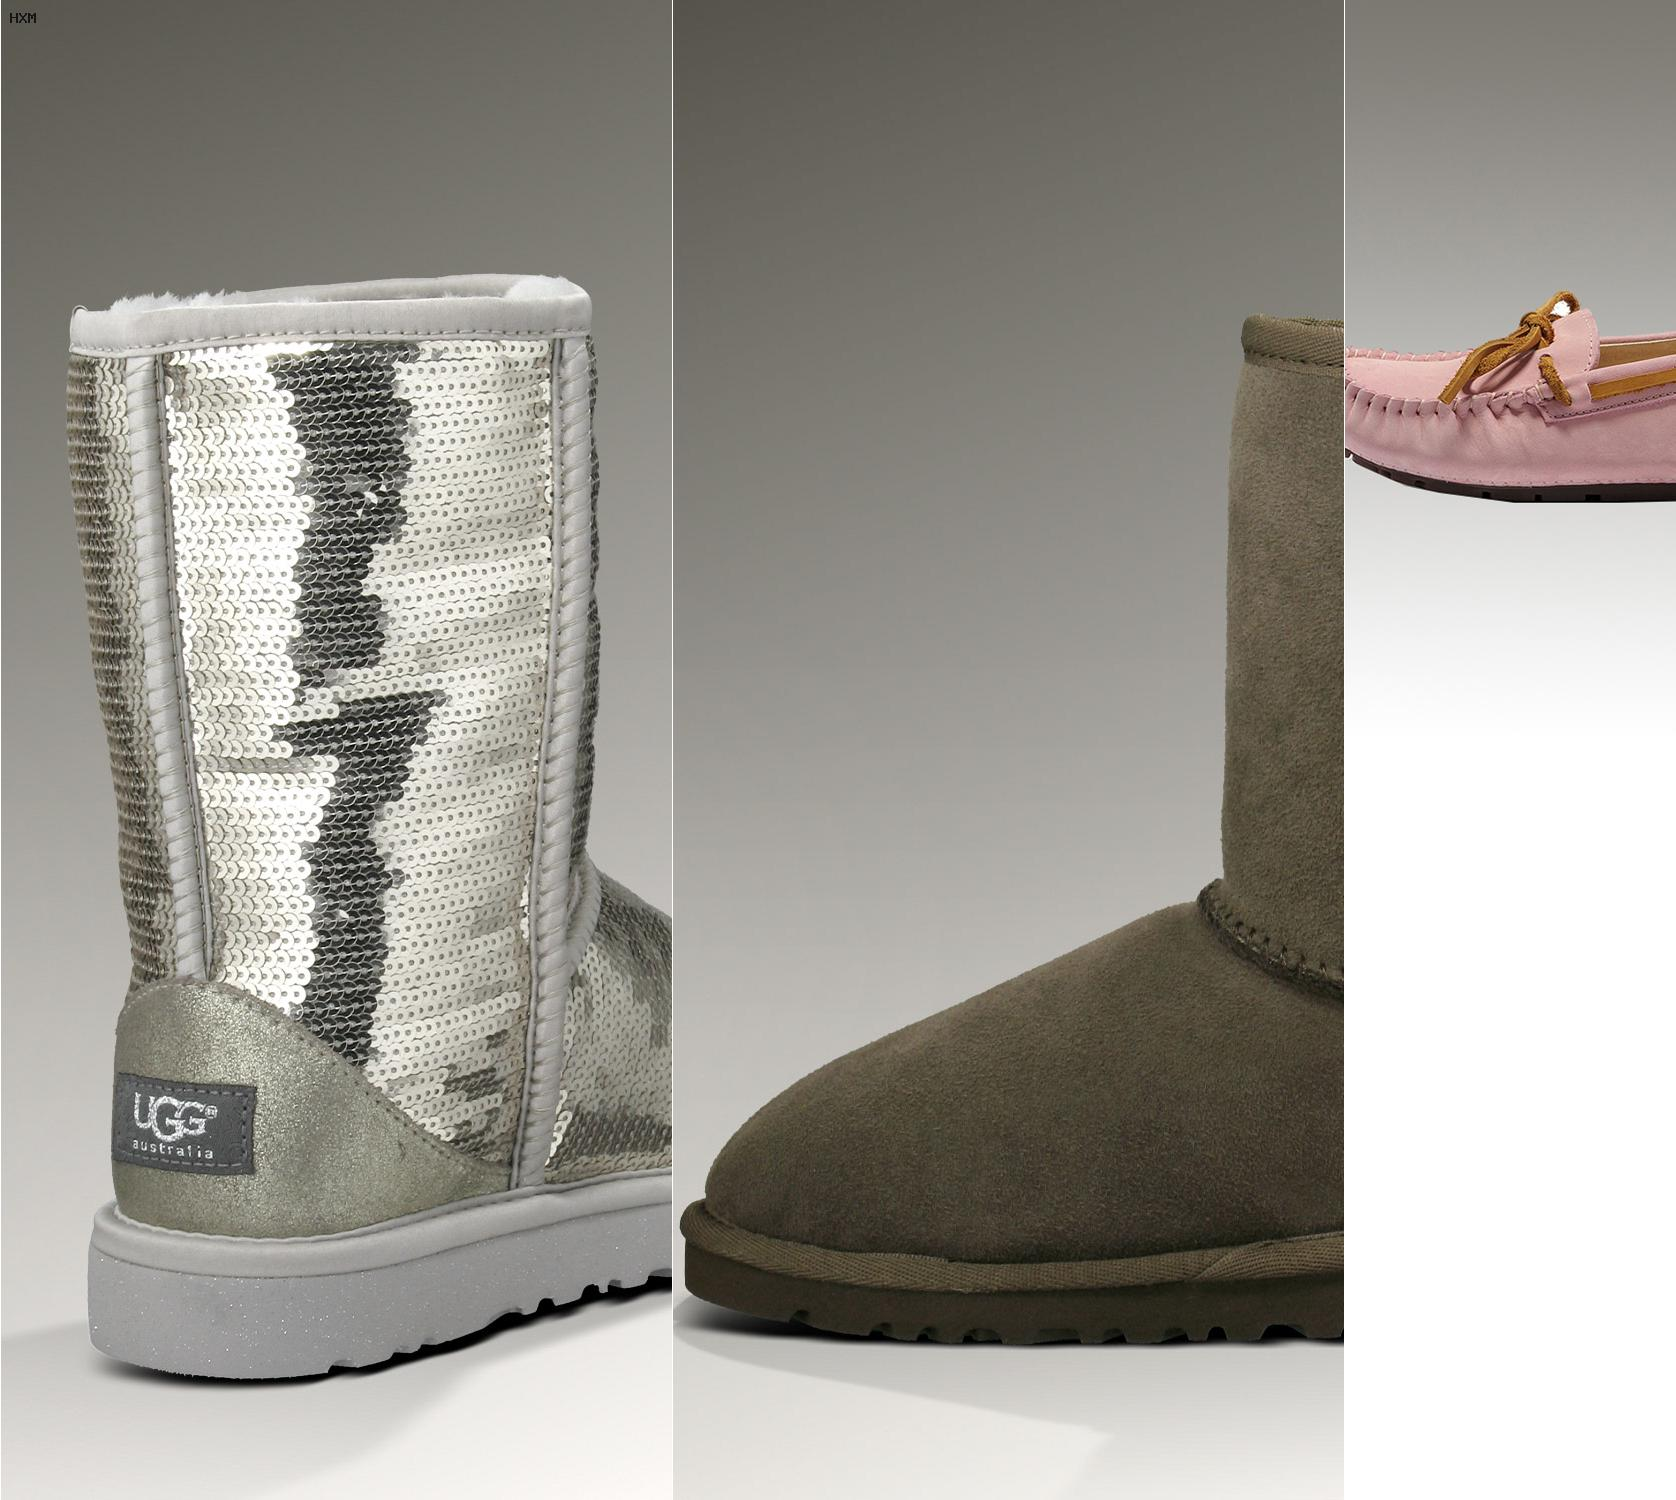 scarpe ugg amazon